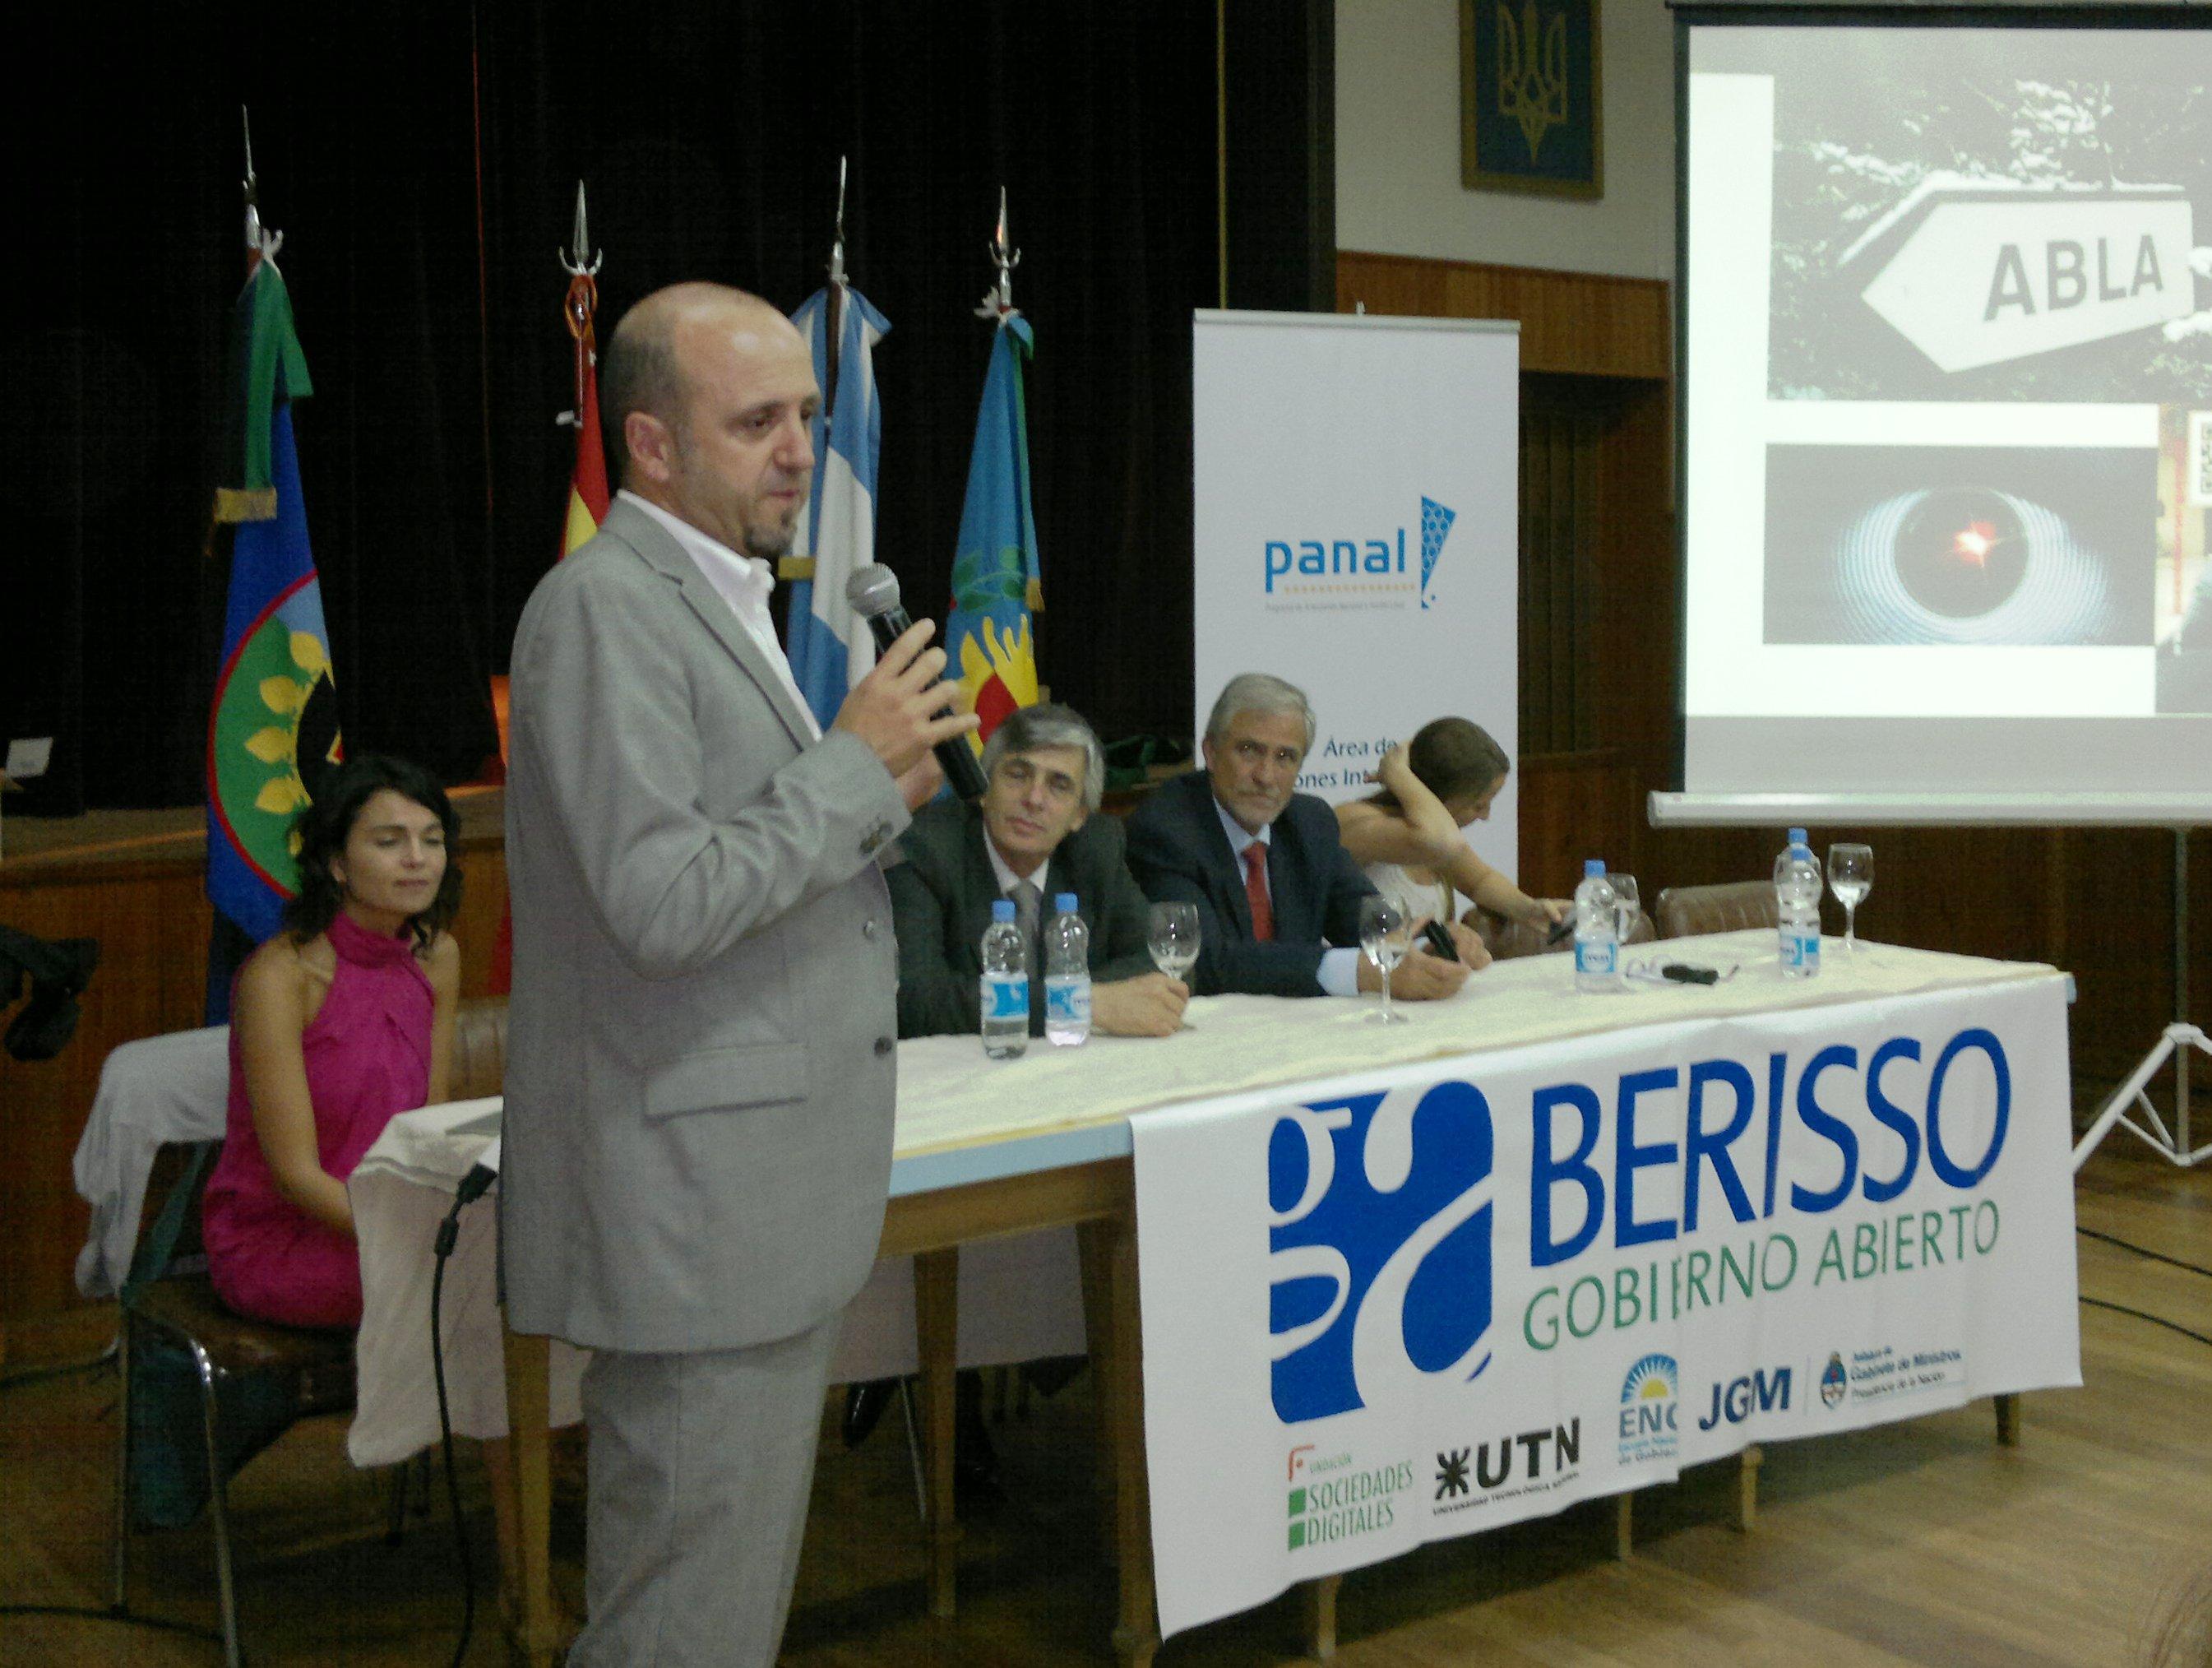 berisso8.jpg